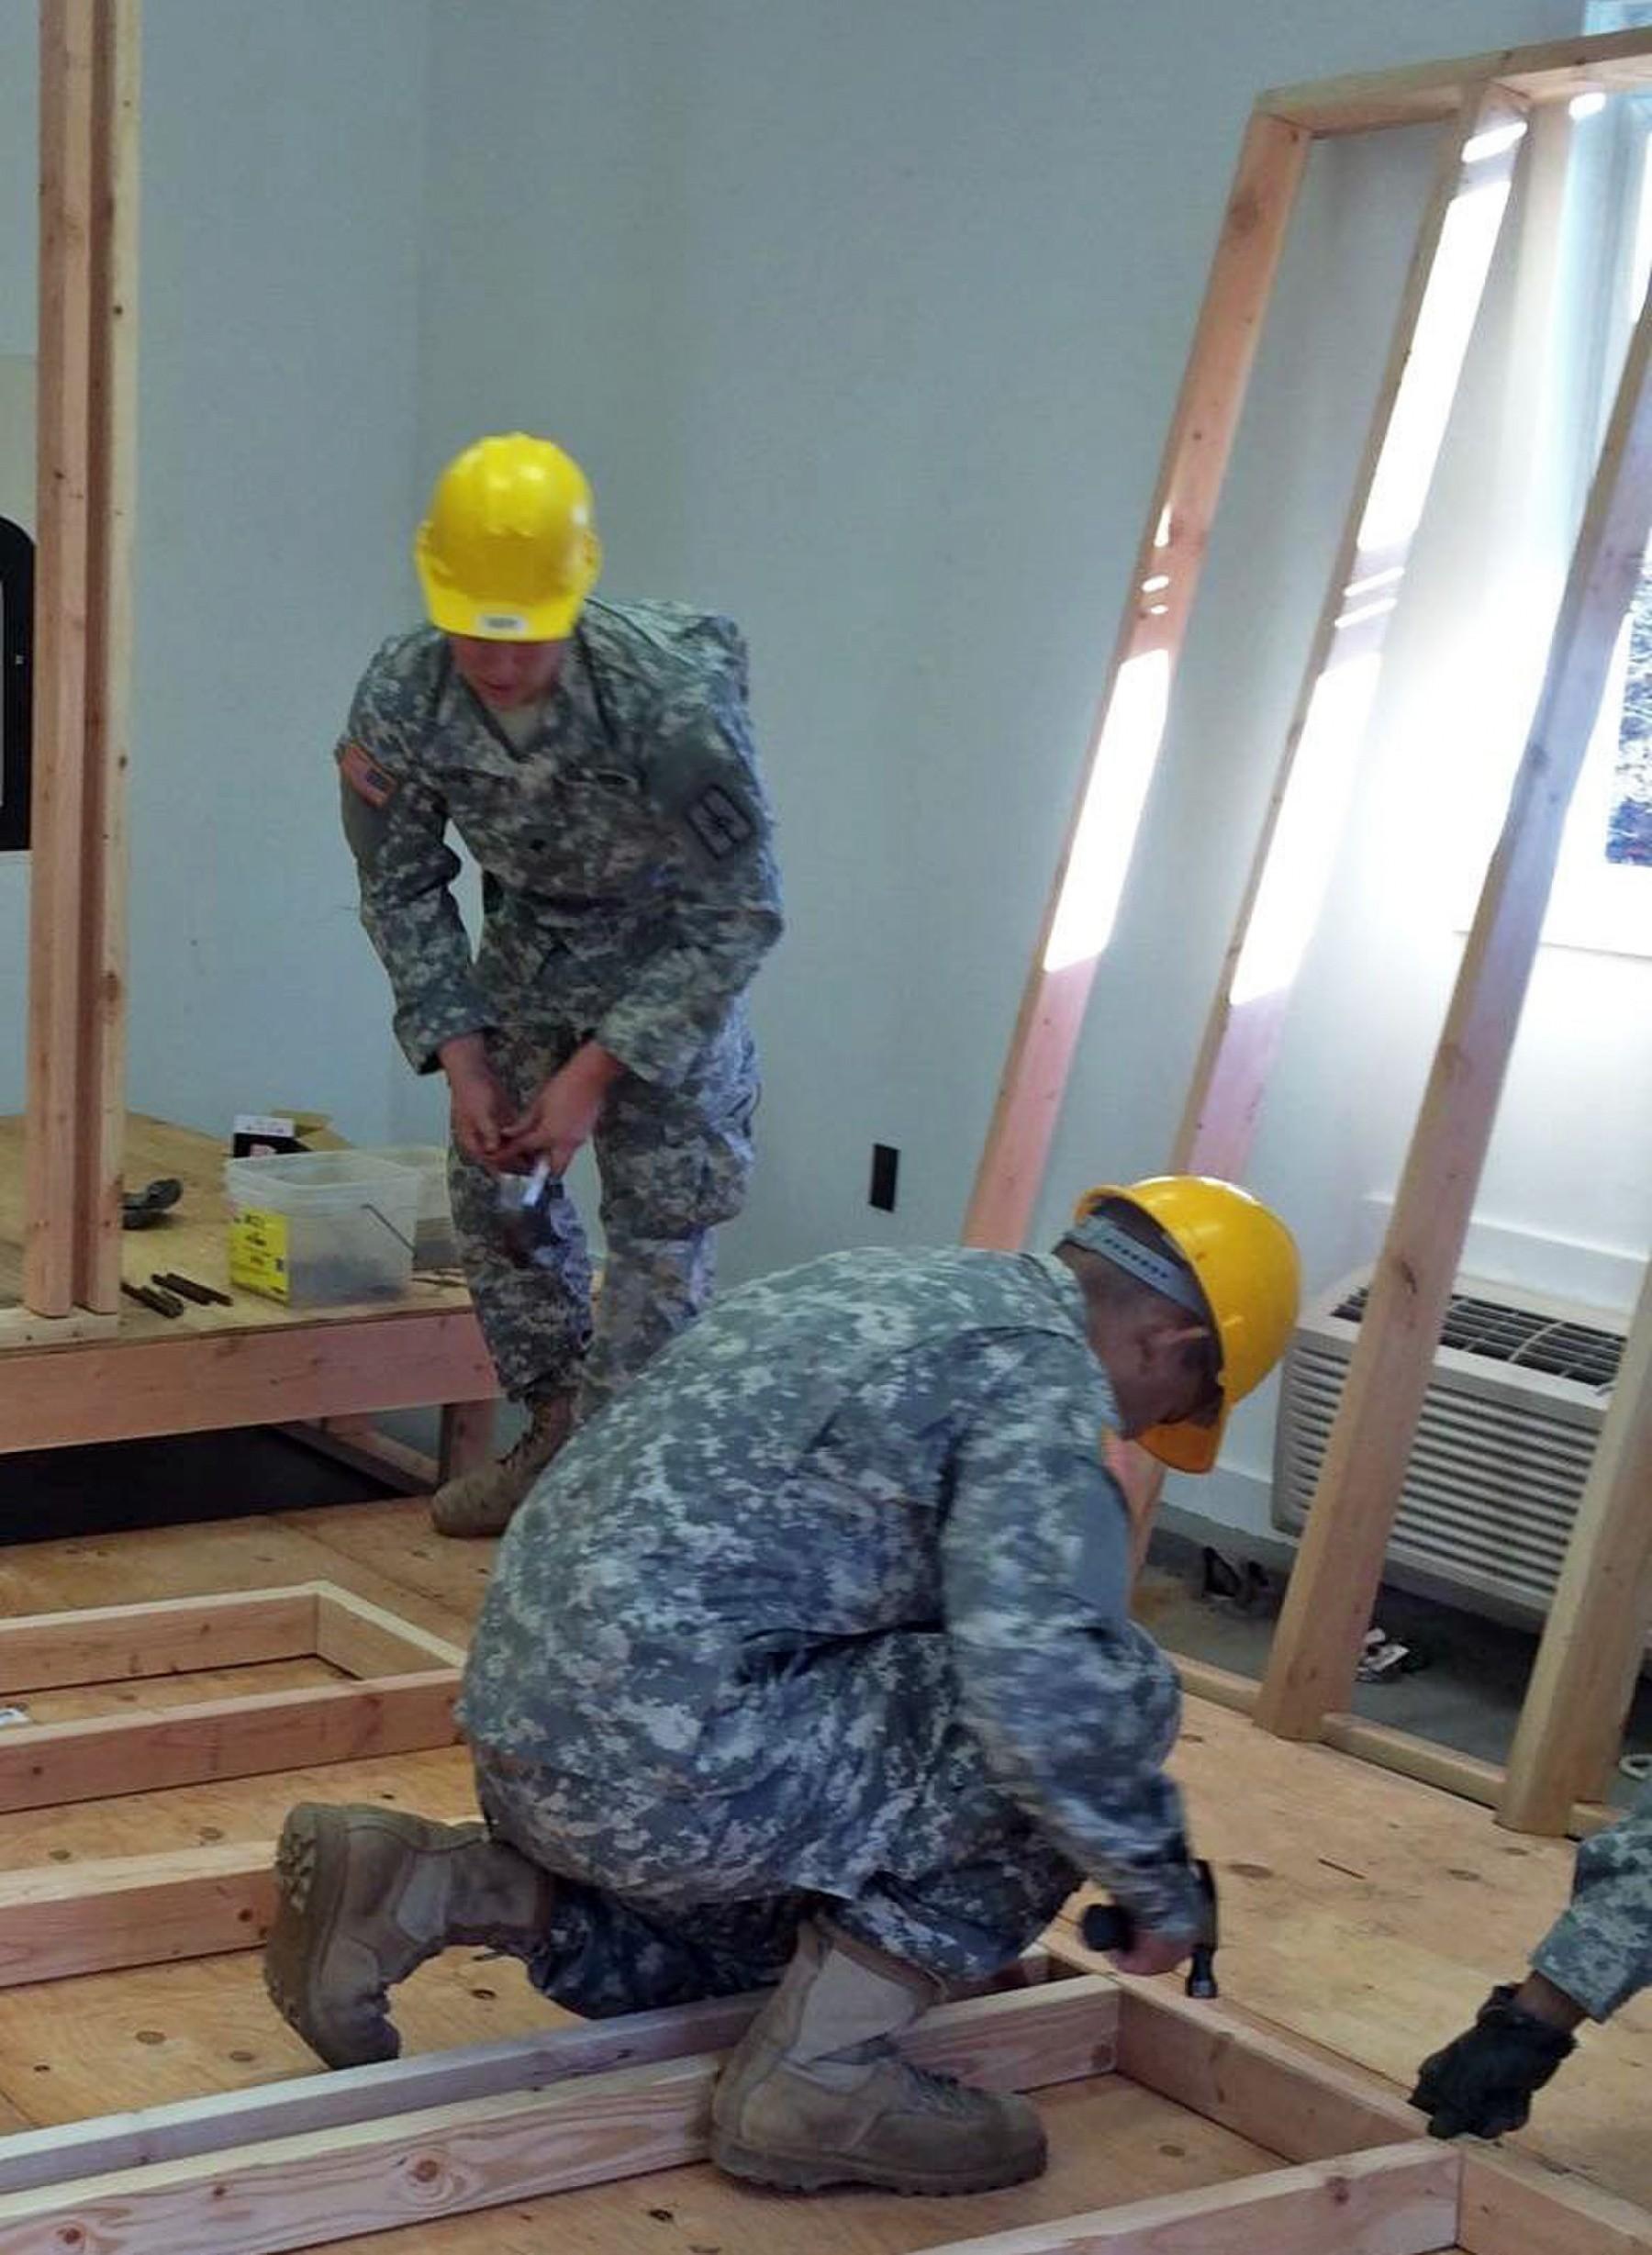 Engineering Space New York Army National Guard Troops Maintain Redstone Wiring Vertical Original